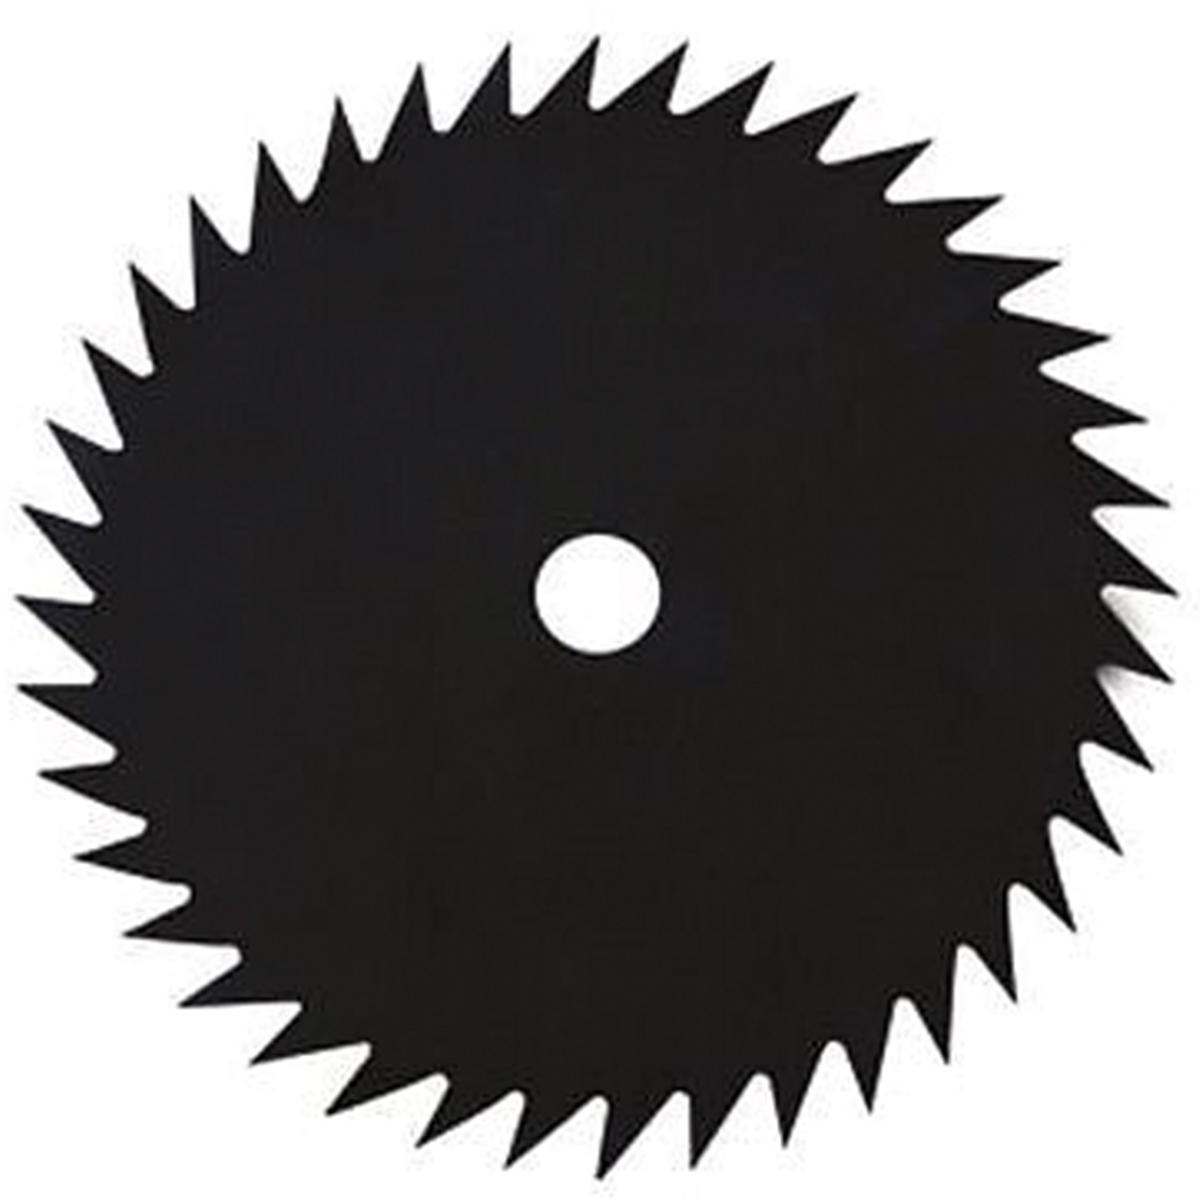 Нож для триммера Ставр